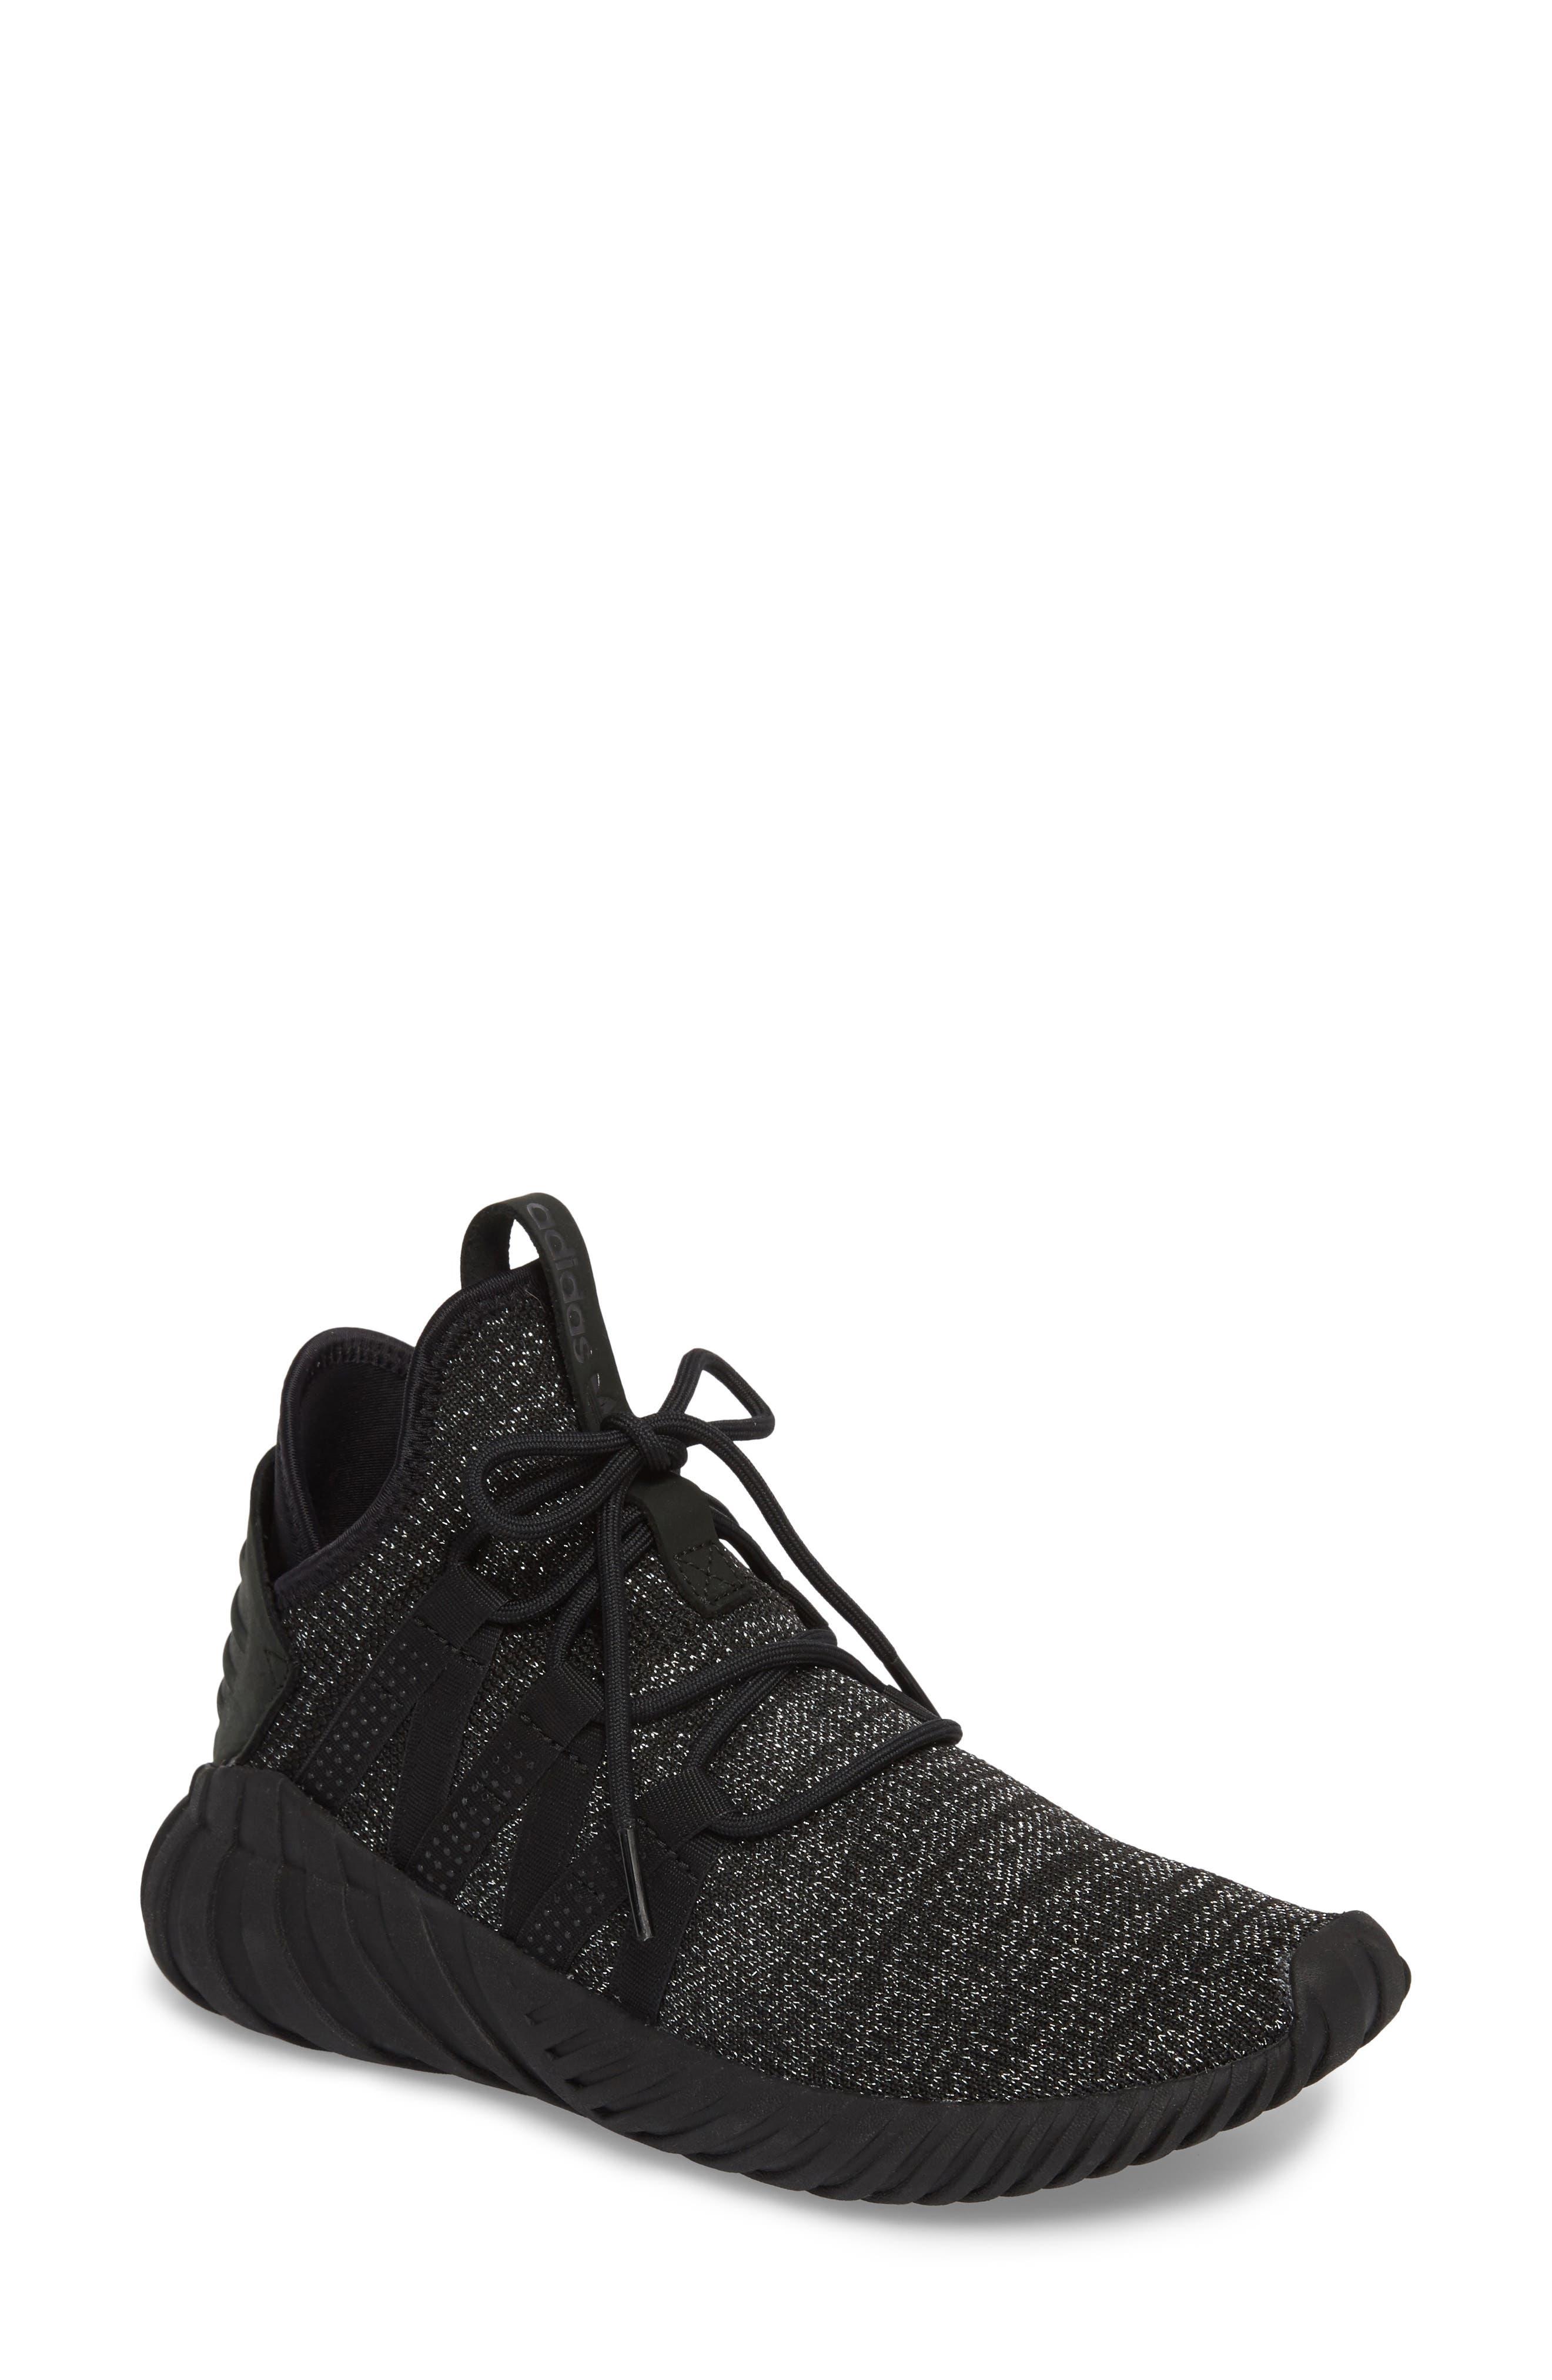 Main Image - adidas Tubular Dawn Primeknit Sneaker (Women)